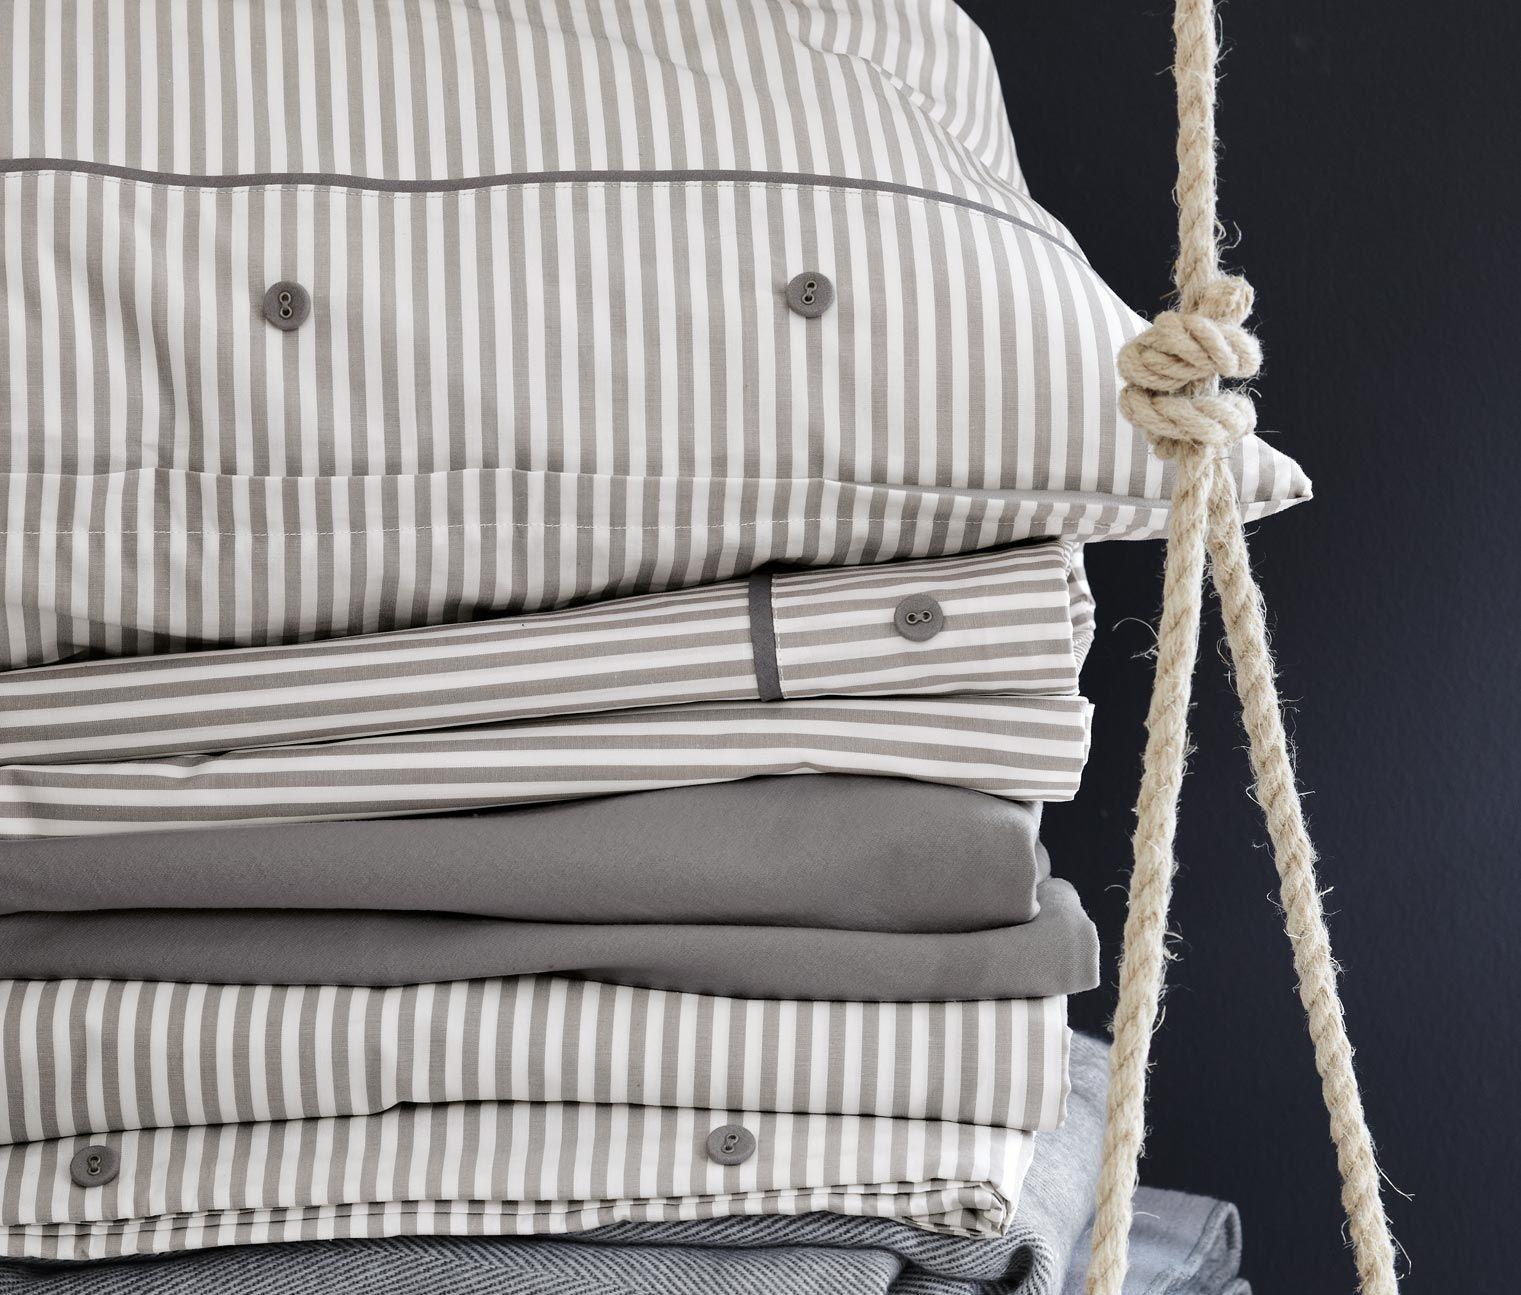 perkal bettw sche tchibo grau gestreift stripes 34 95 buy home pinterest bettwaesche. Black Bedroom Furniture Sets. Home Design Ideas